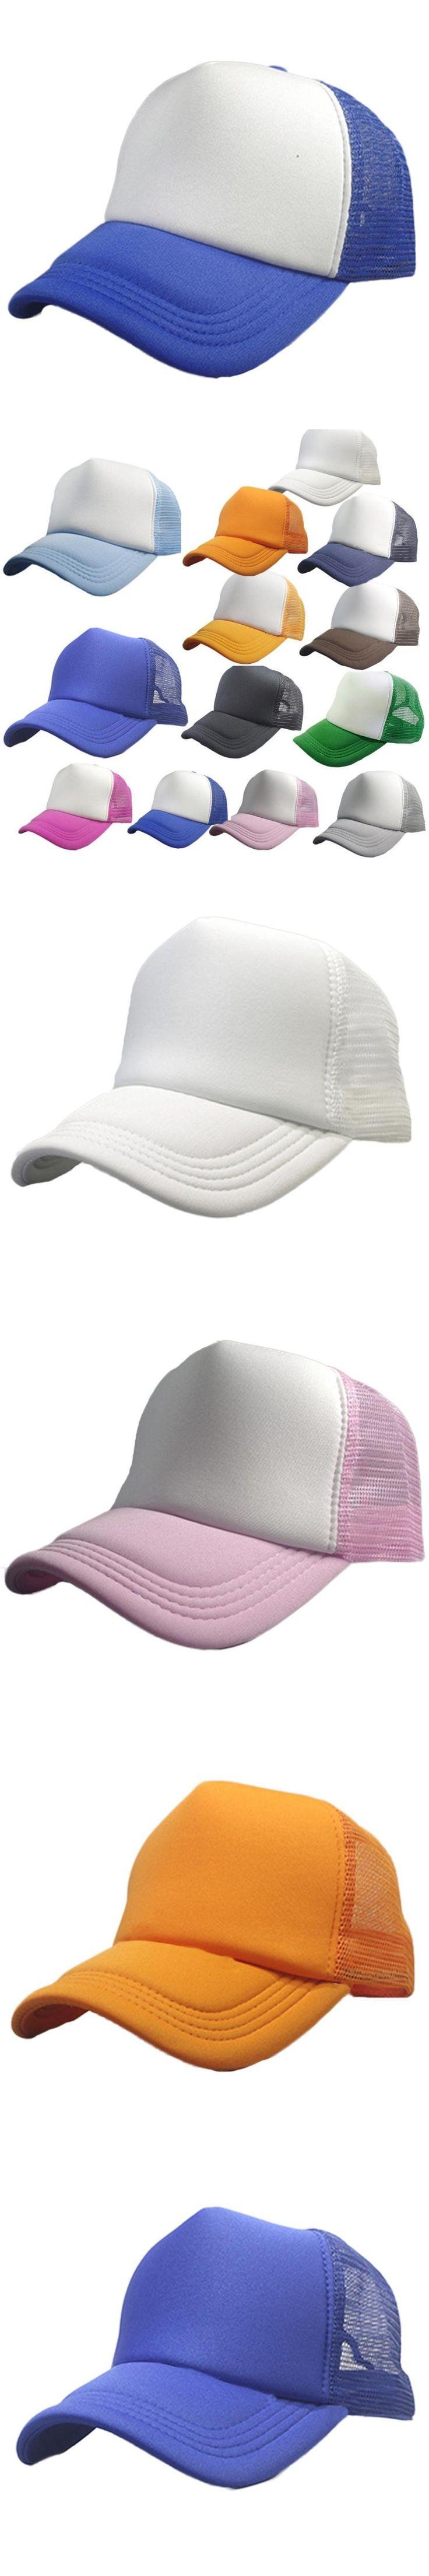 2017 Best Sale Summer Solid Adult Mesh Cap Fashion Baseball Cap Women And Men Sun Hat2017 Best Sale womens baseball caps gorras